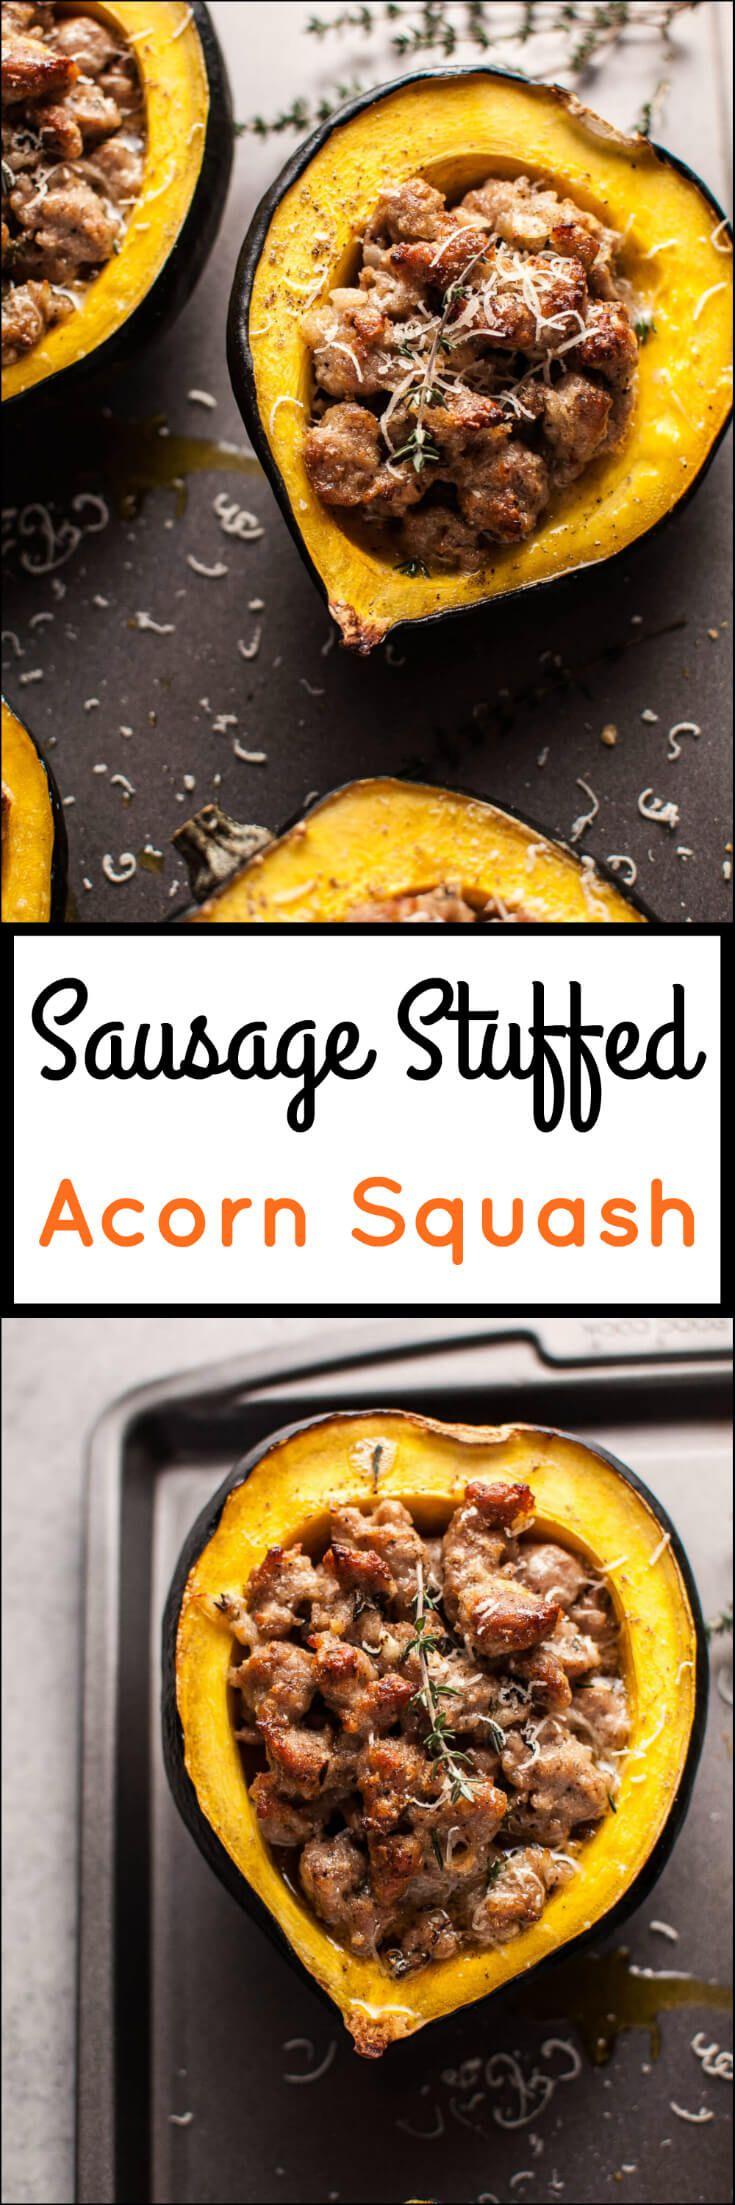 Sausage Parmesan Stuffed Acorn Squash Recipe Acorn Squash